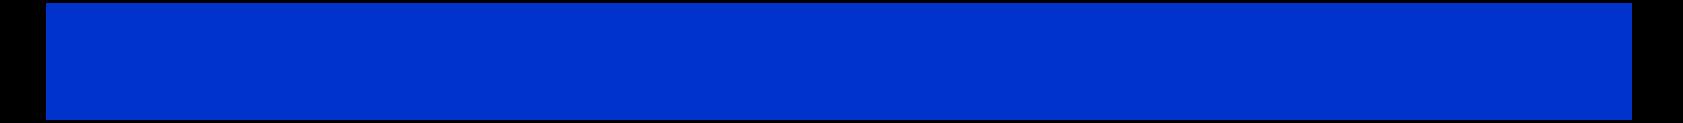 France Code